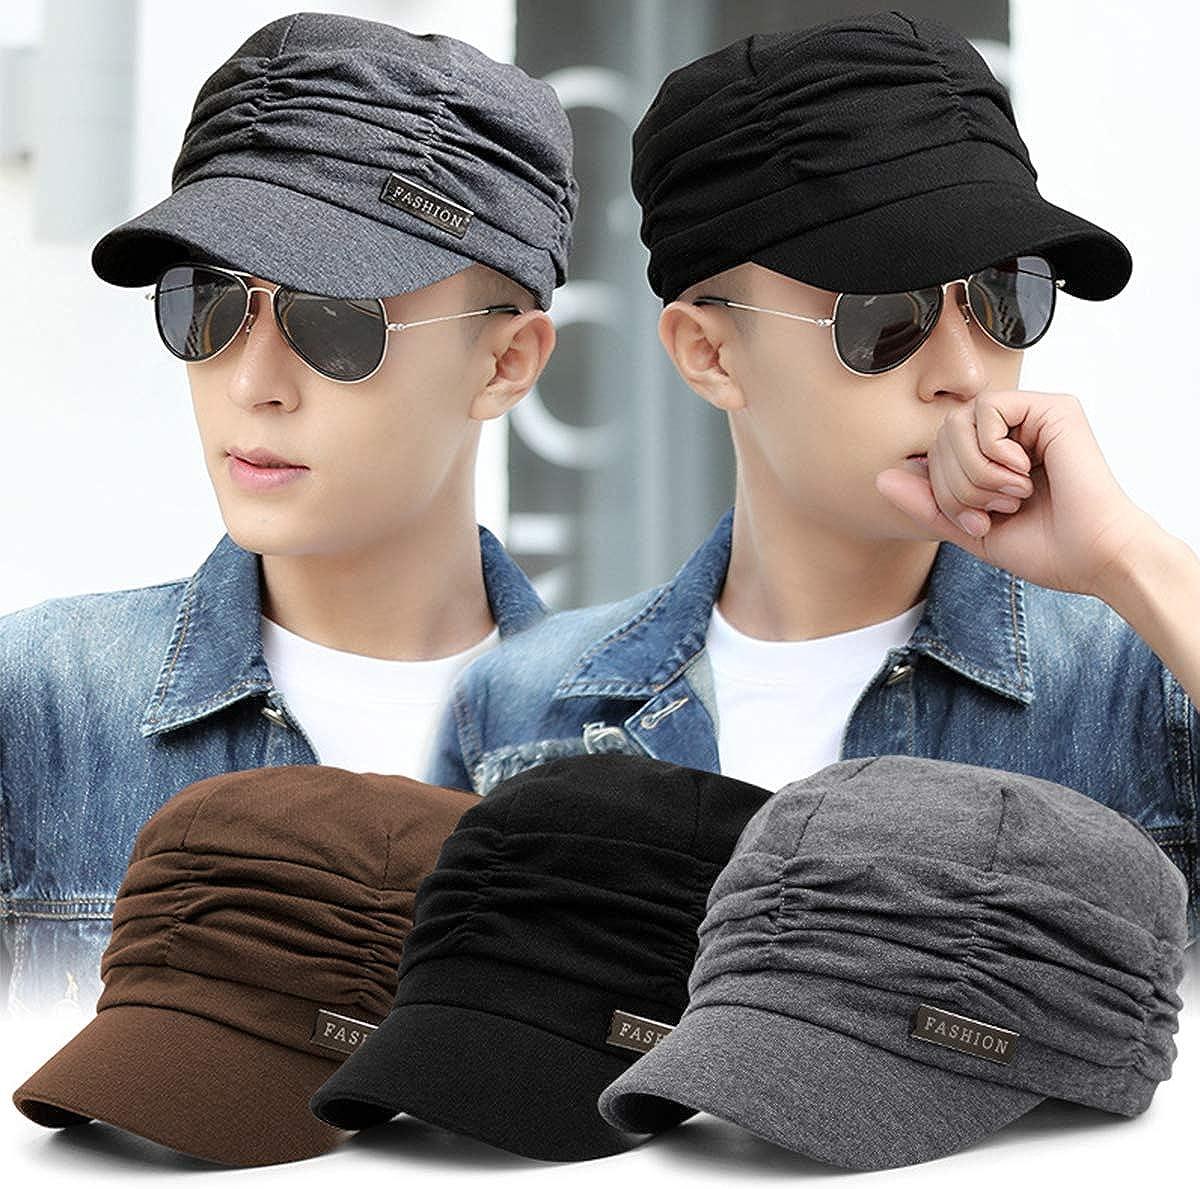 Kajeer Pleated Newsboy Caps Soft Octagonal Hat Breathable Beret UV Protection Baseball Cap Flat Cap for Women /& Man